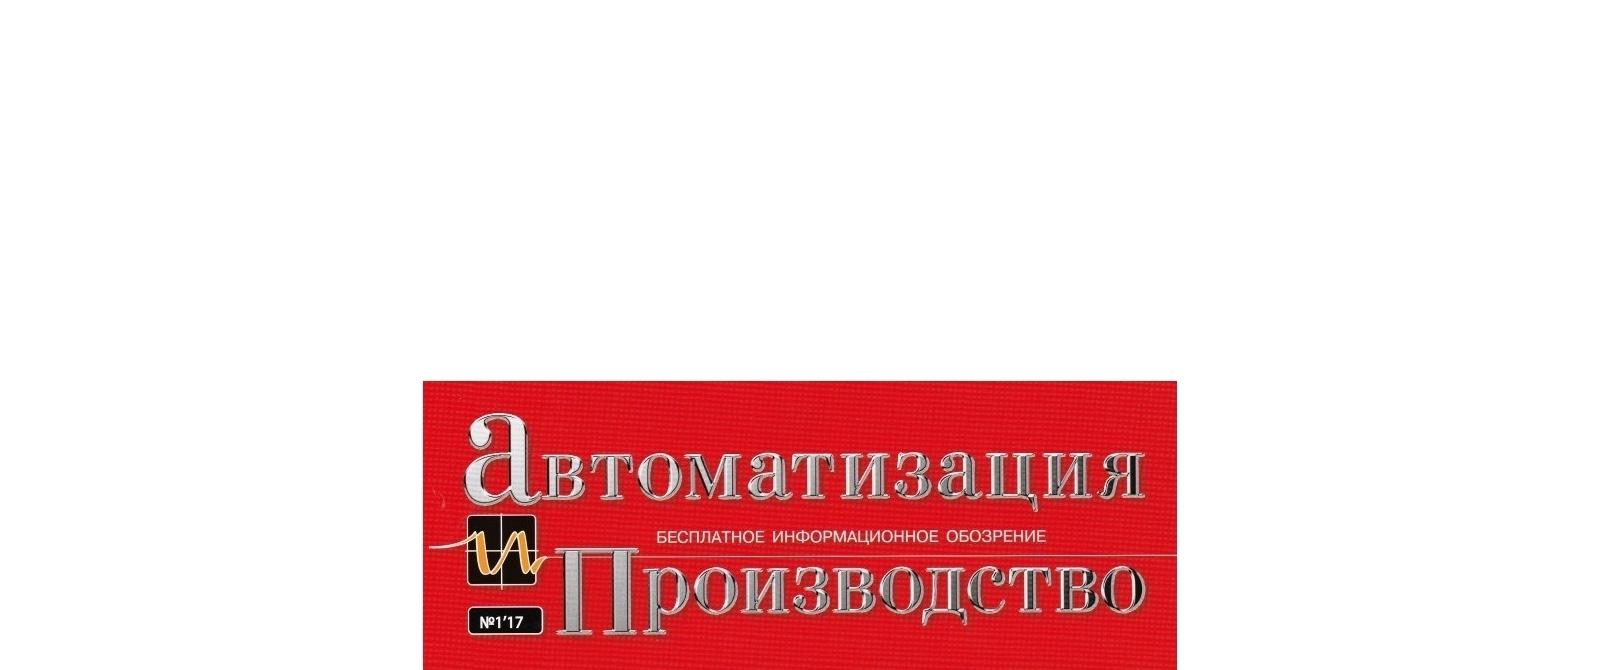 Журнал «Автоматизация и производство» № 1/17